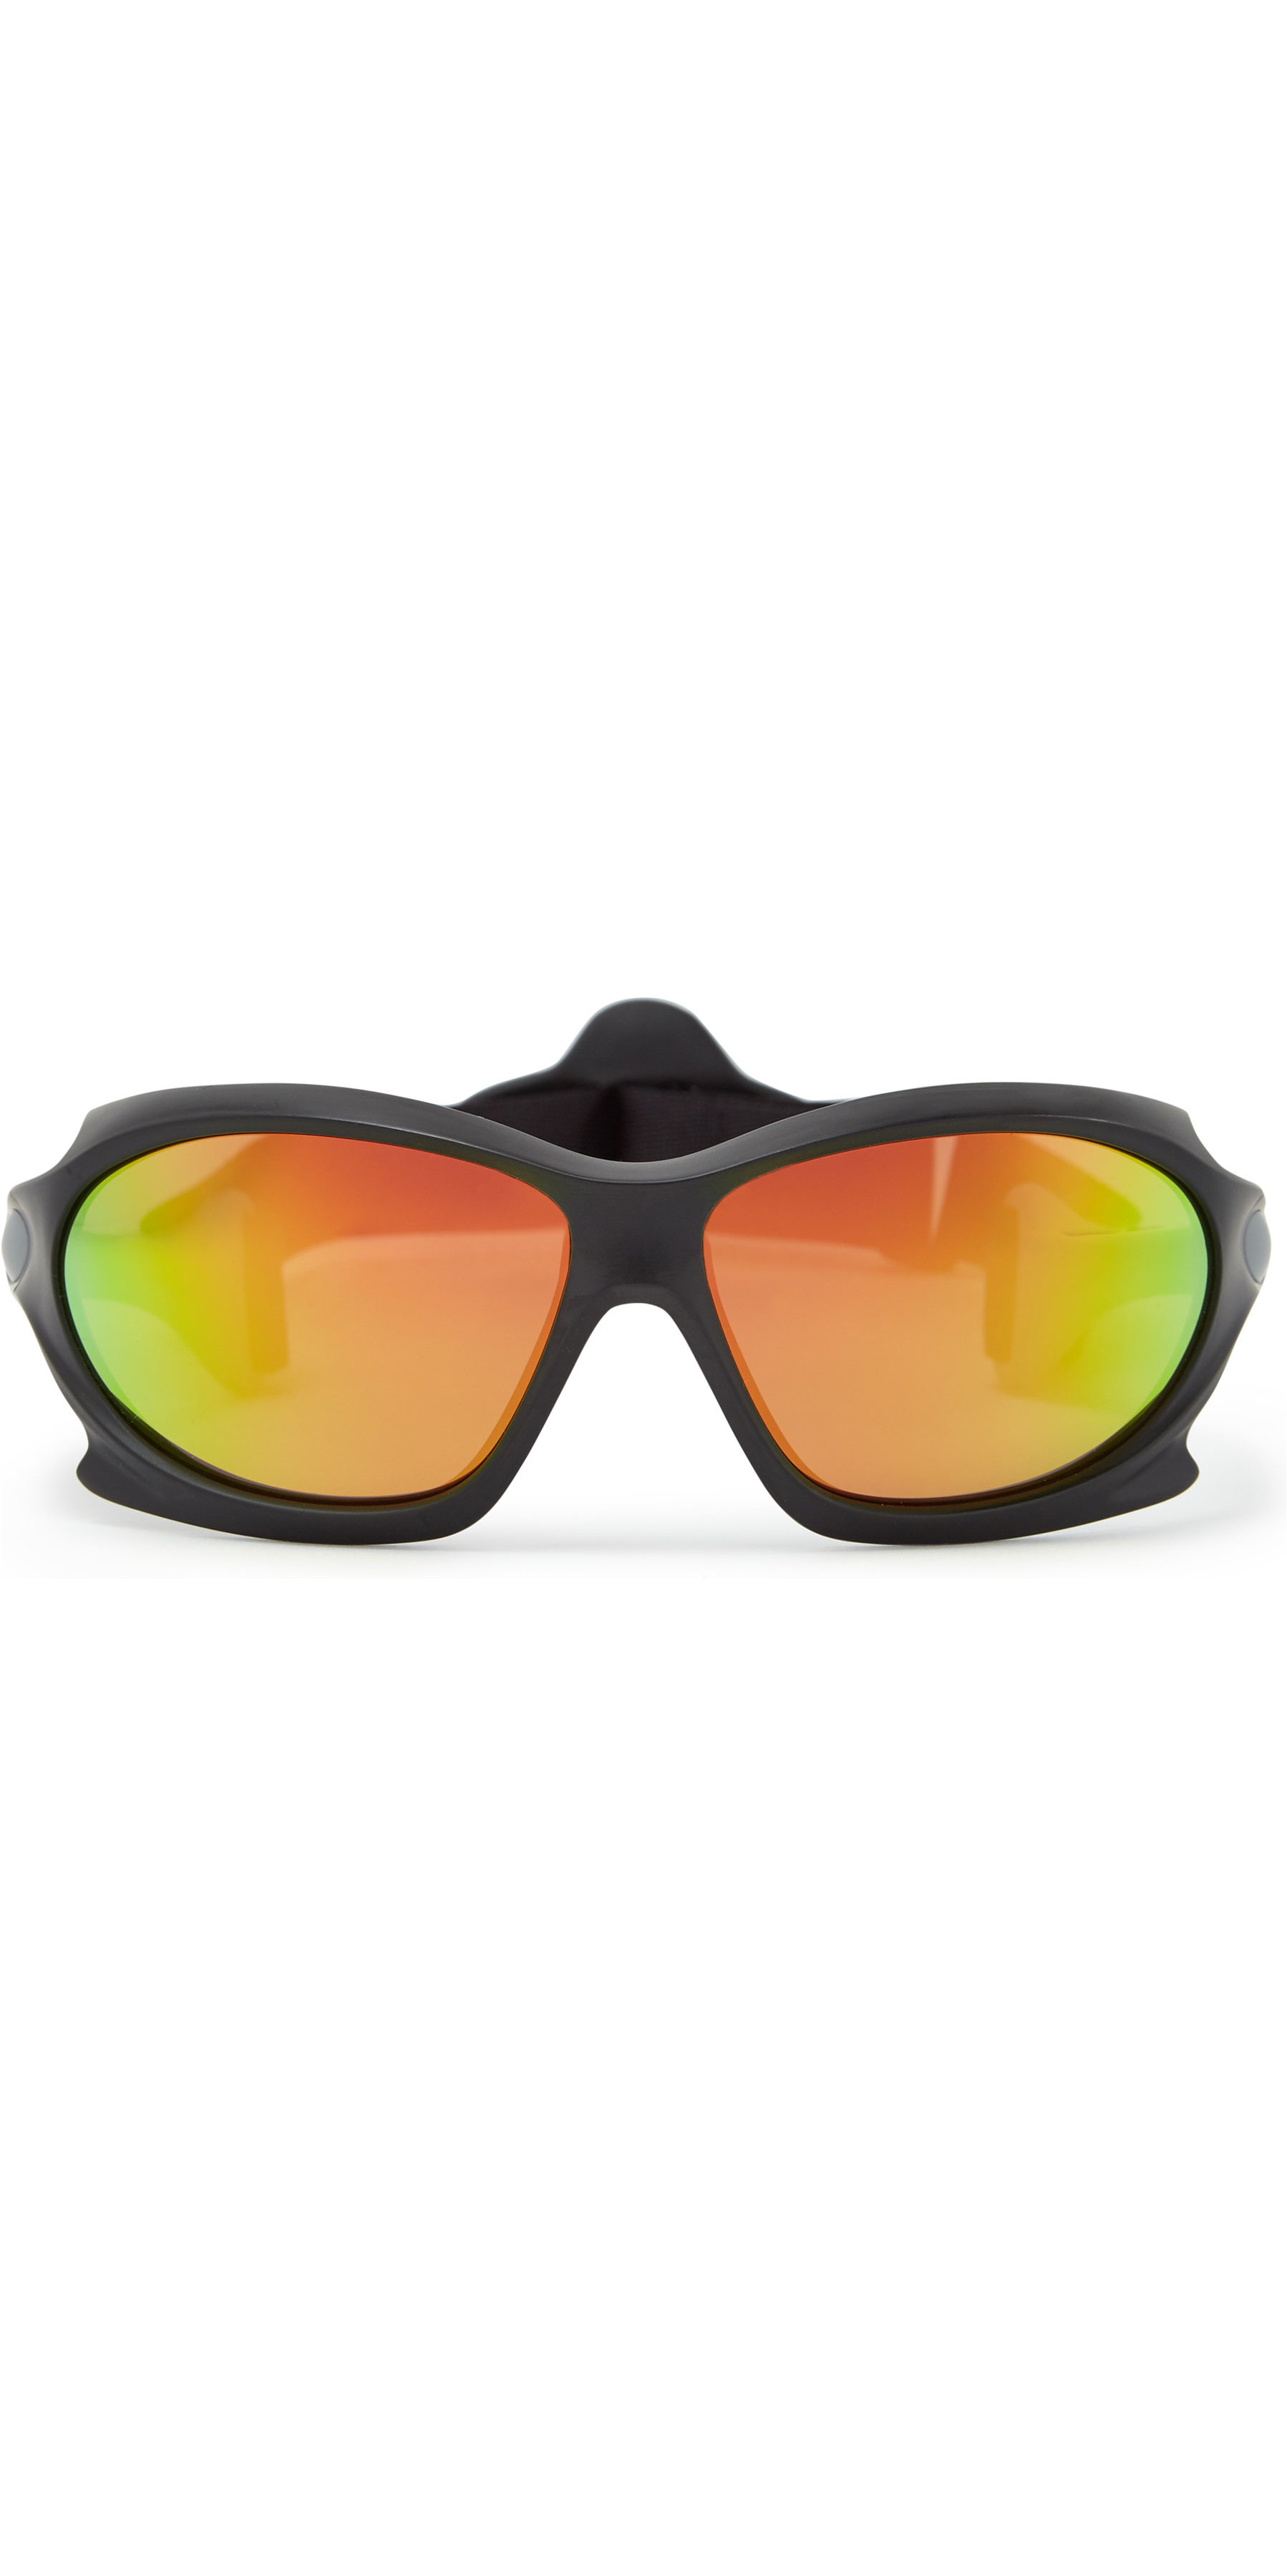 6935062df0d 2019 Gill Race Ocean Sunglasses Black Orange Rs27 - Mens Sunglasses ...